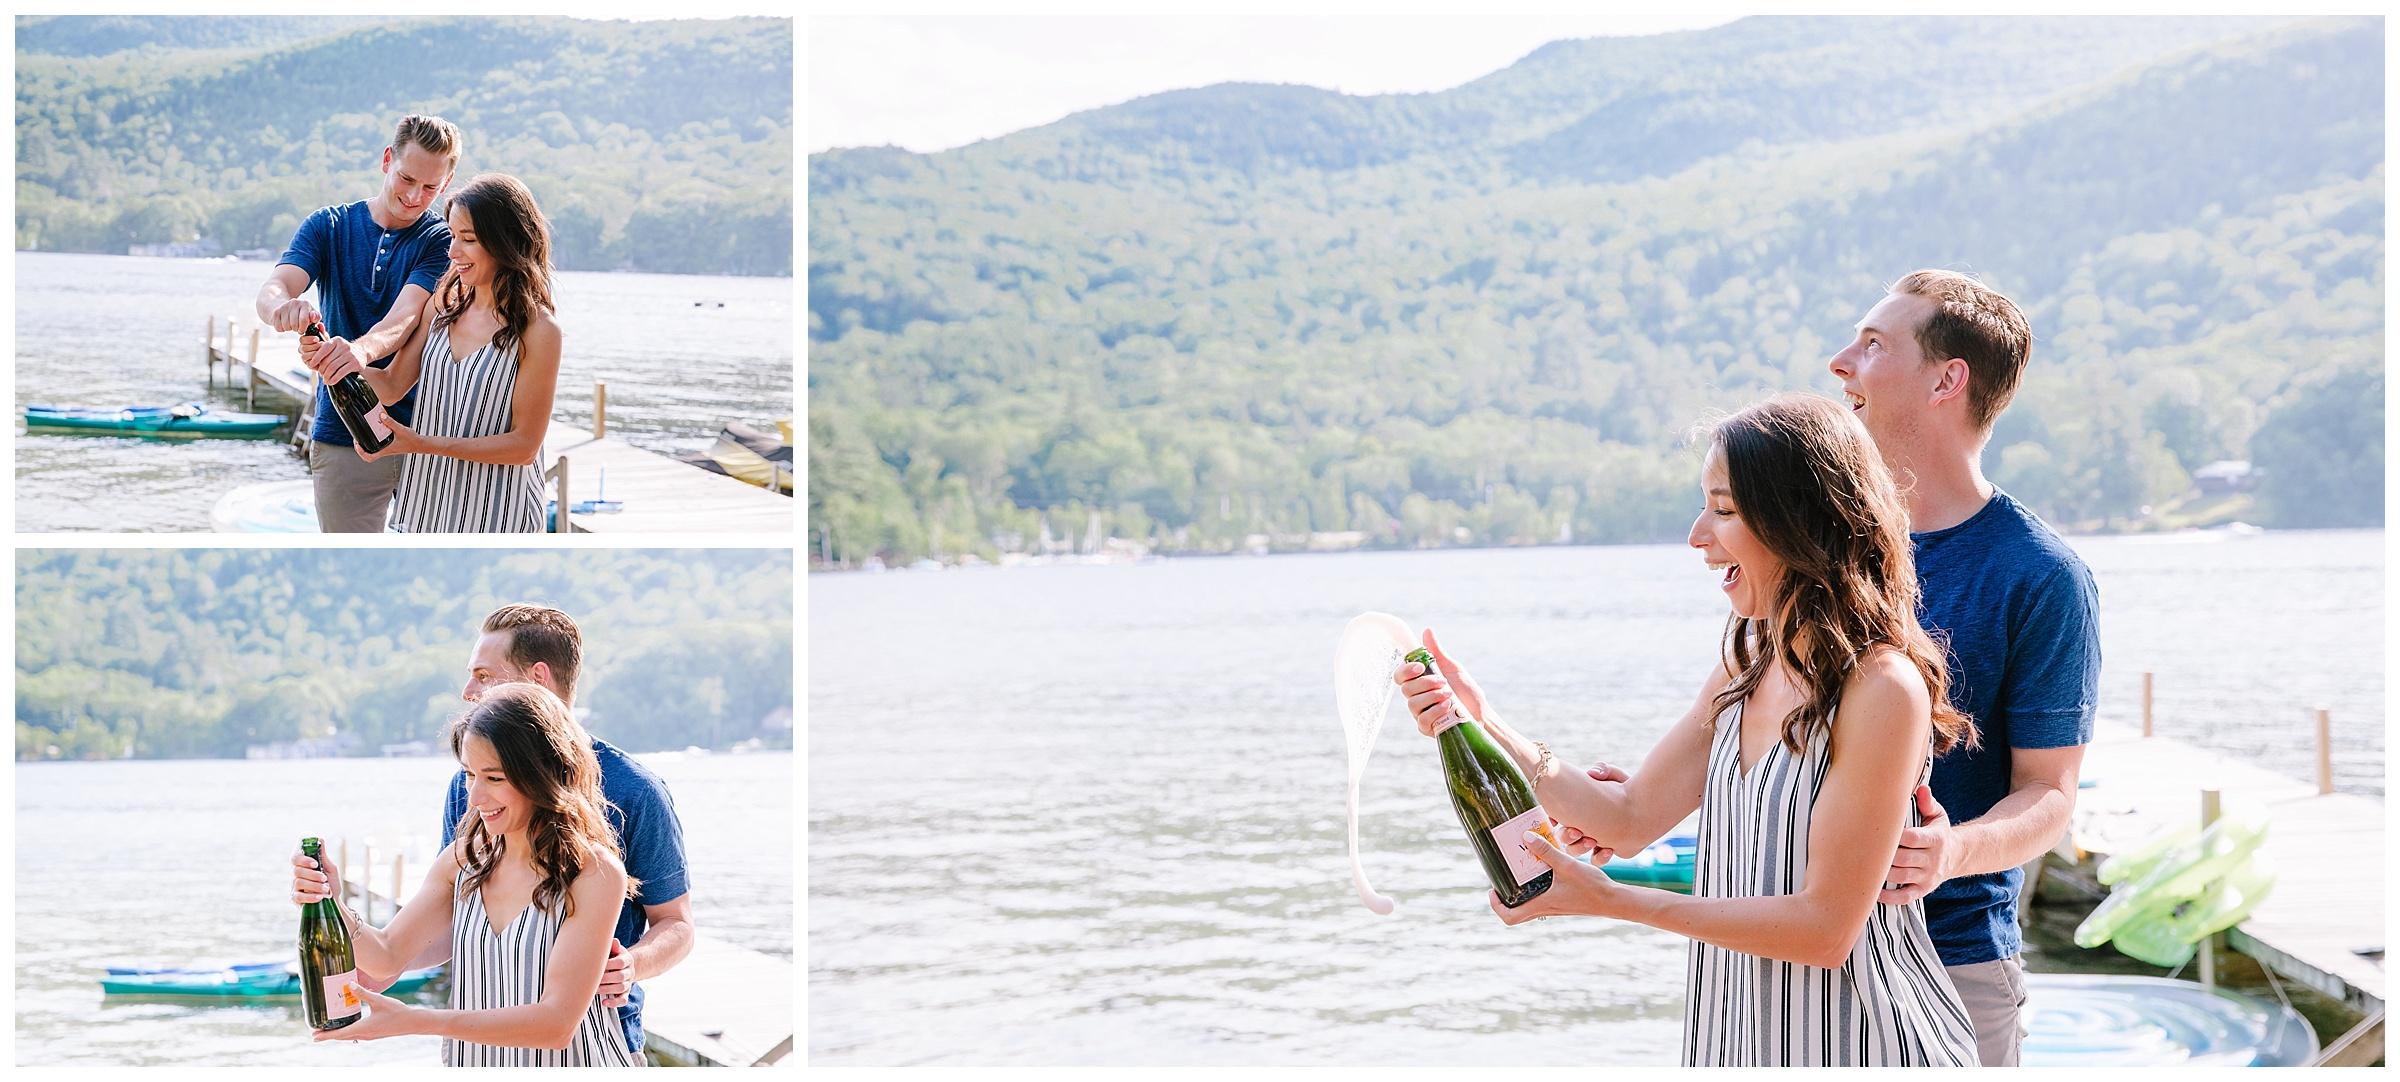 Alicia Morse,Alicia-Matt_Engagement,BLM,Brianna Morrissey,Brie Morrissey,Engagment Photos,Jul,July,Lake engagement,Photo,Photographer,Photography,www.blmphoto.com/contact,©BLM Photography 2019,